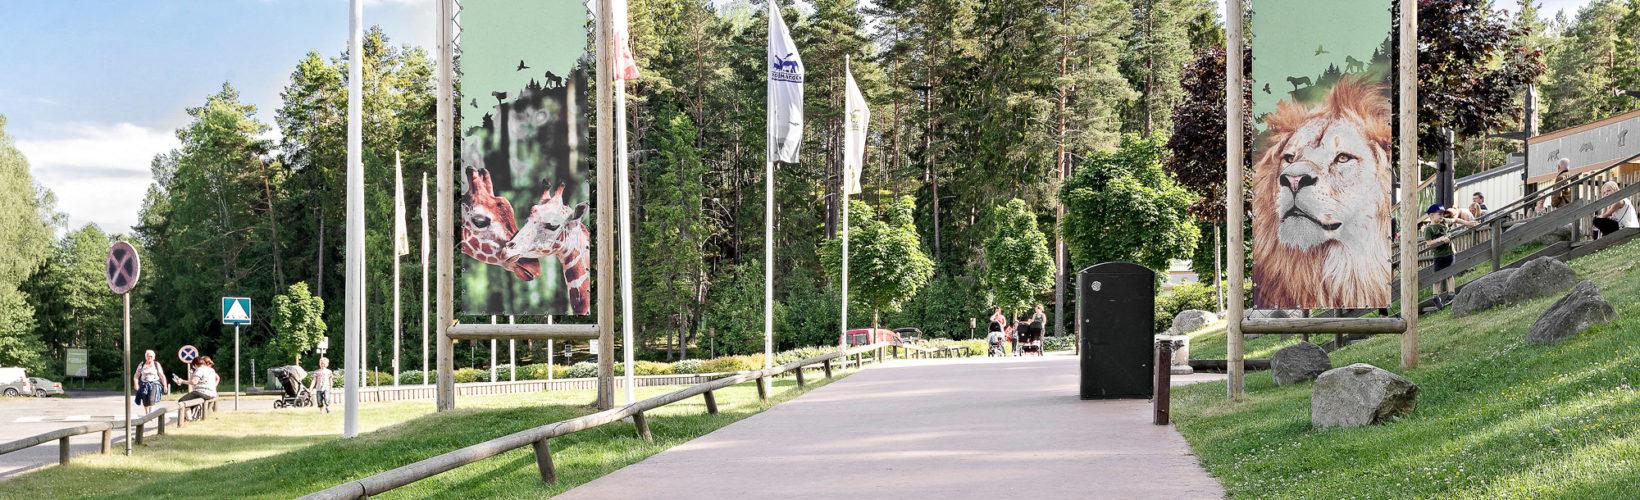 Kolmården Wildlife Park